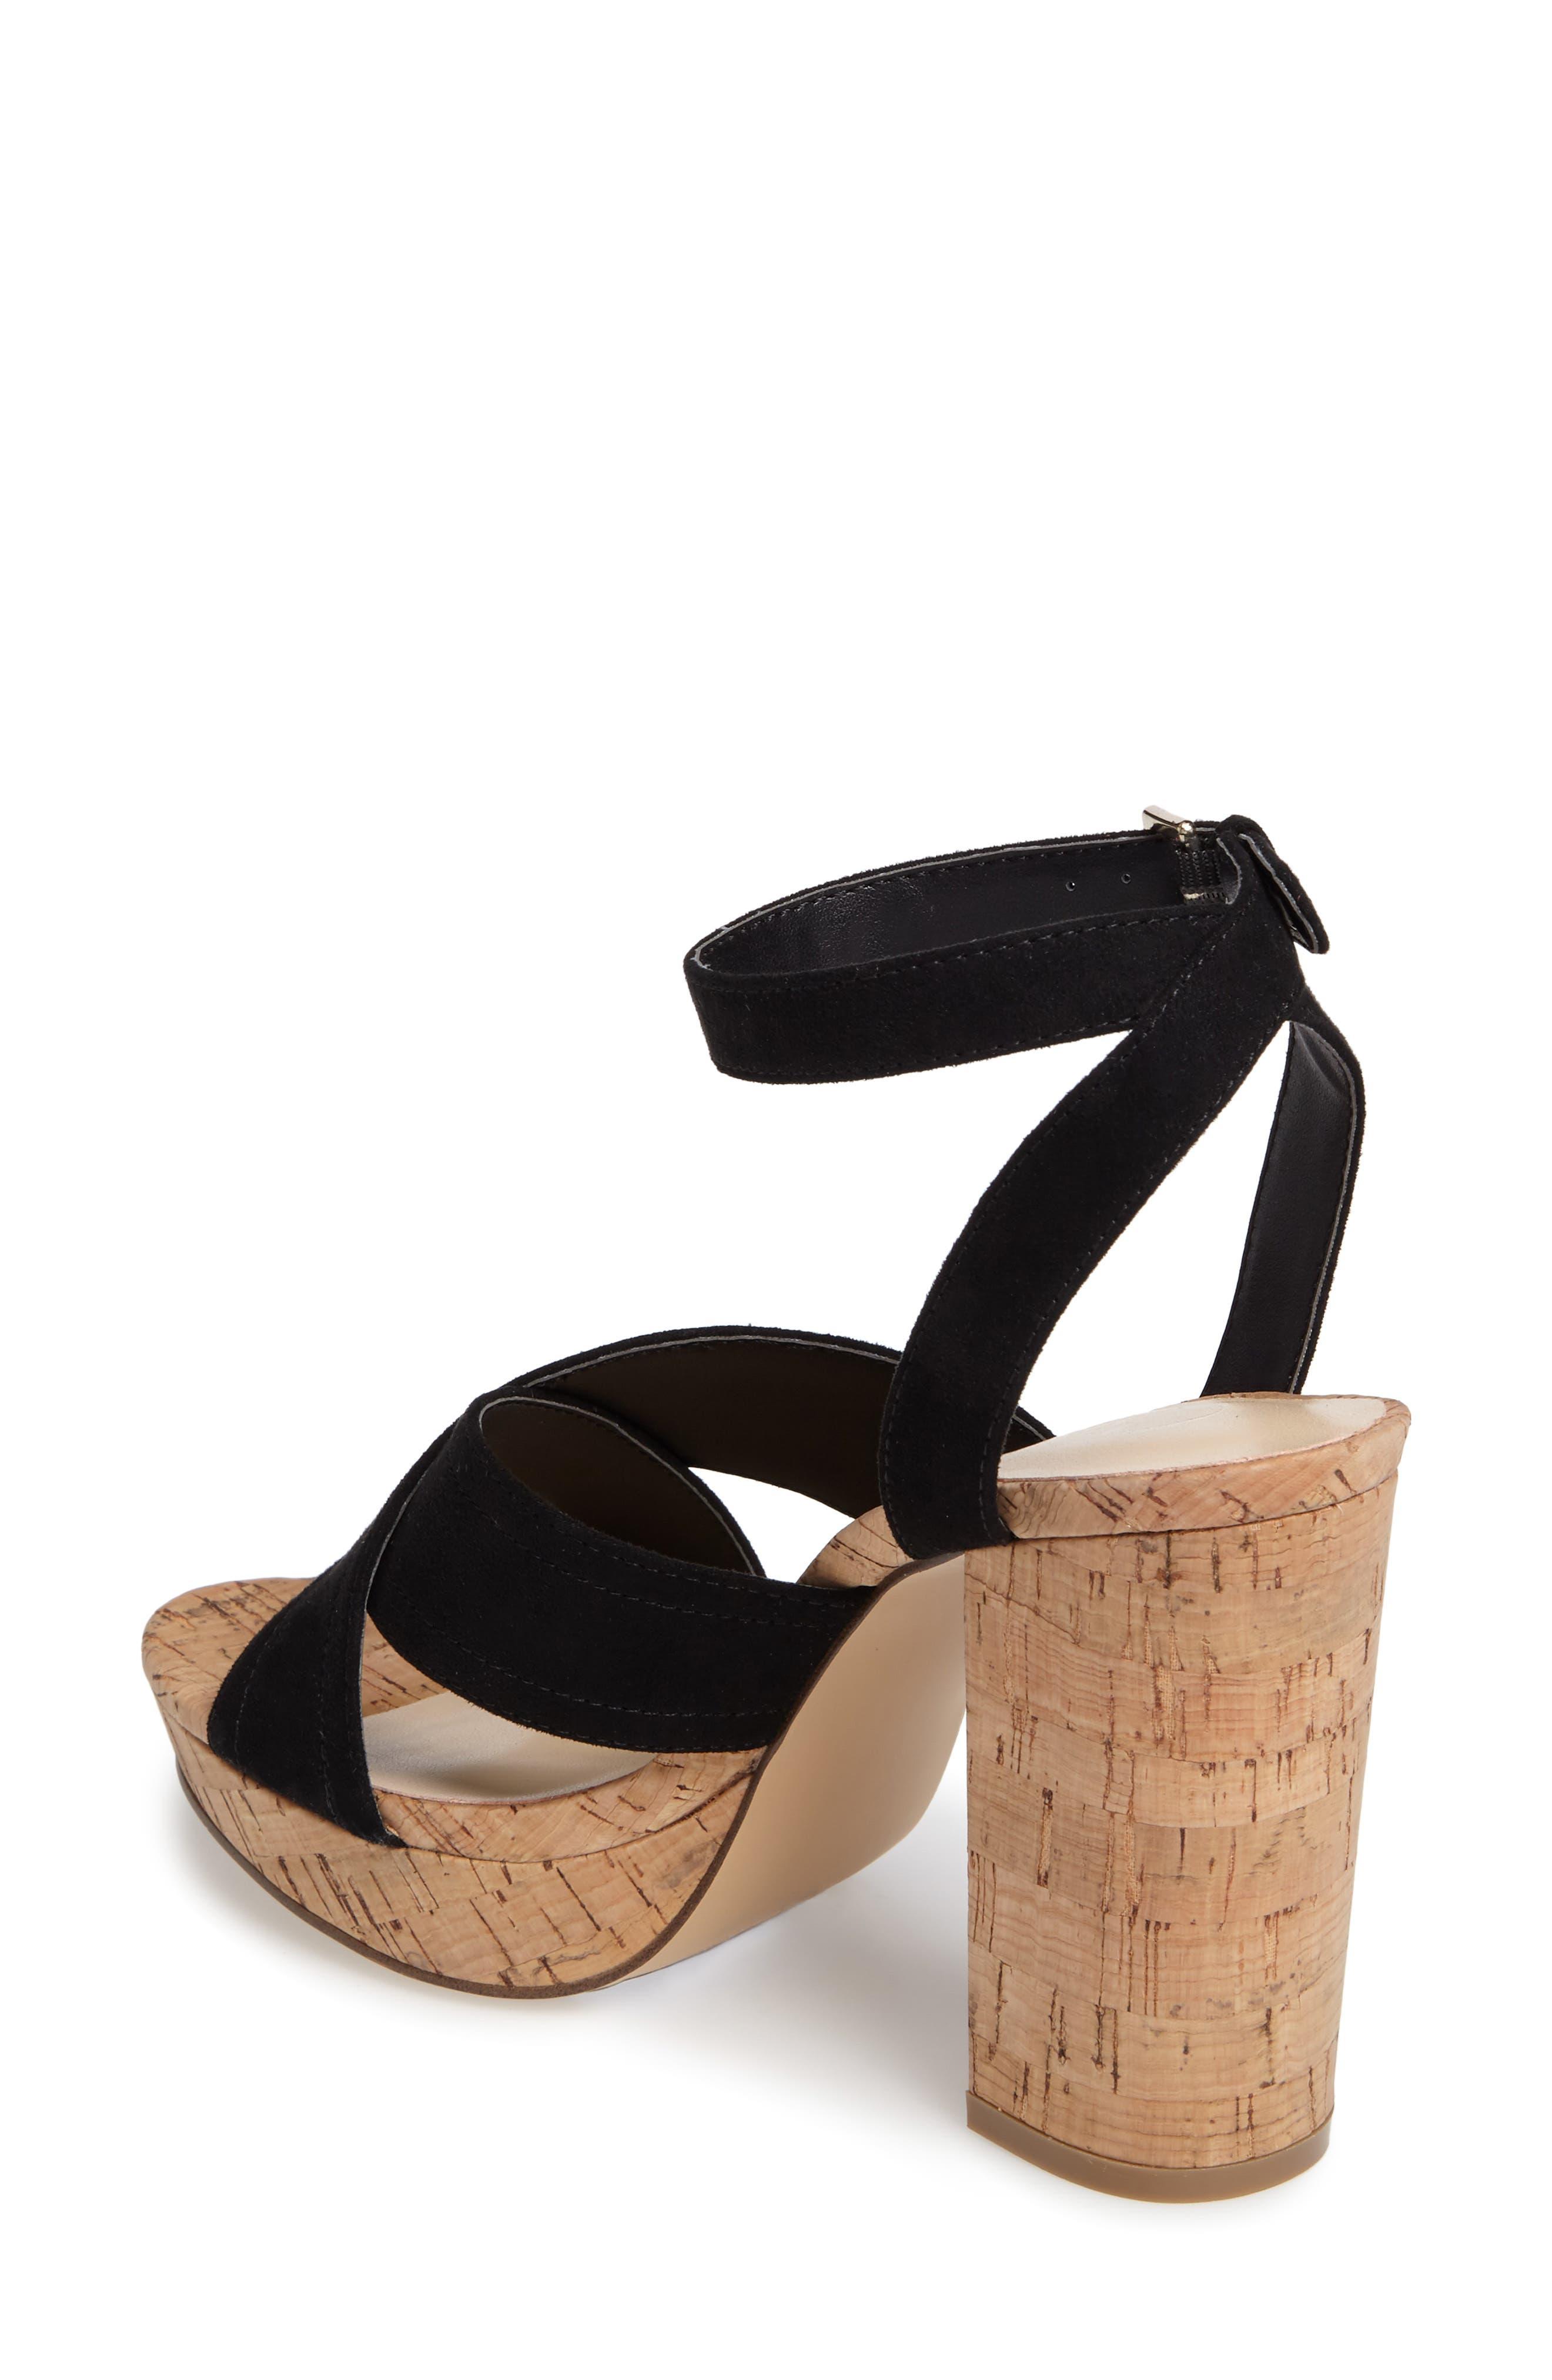 Windye Platform Ankle Strap Sandal,                             Alternate thumbnail 2, color,                             003